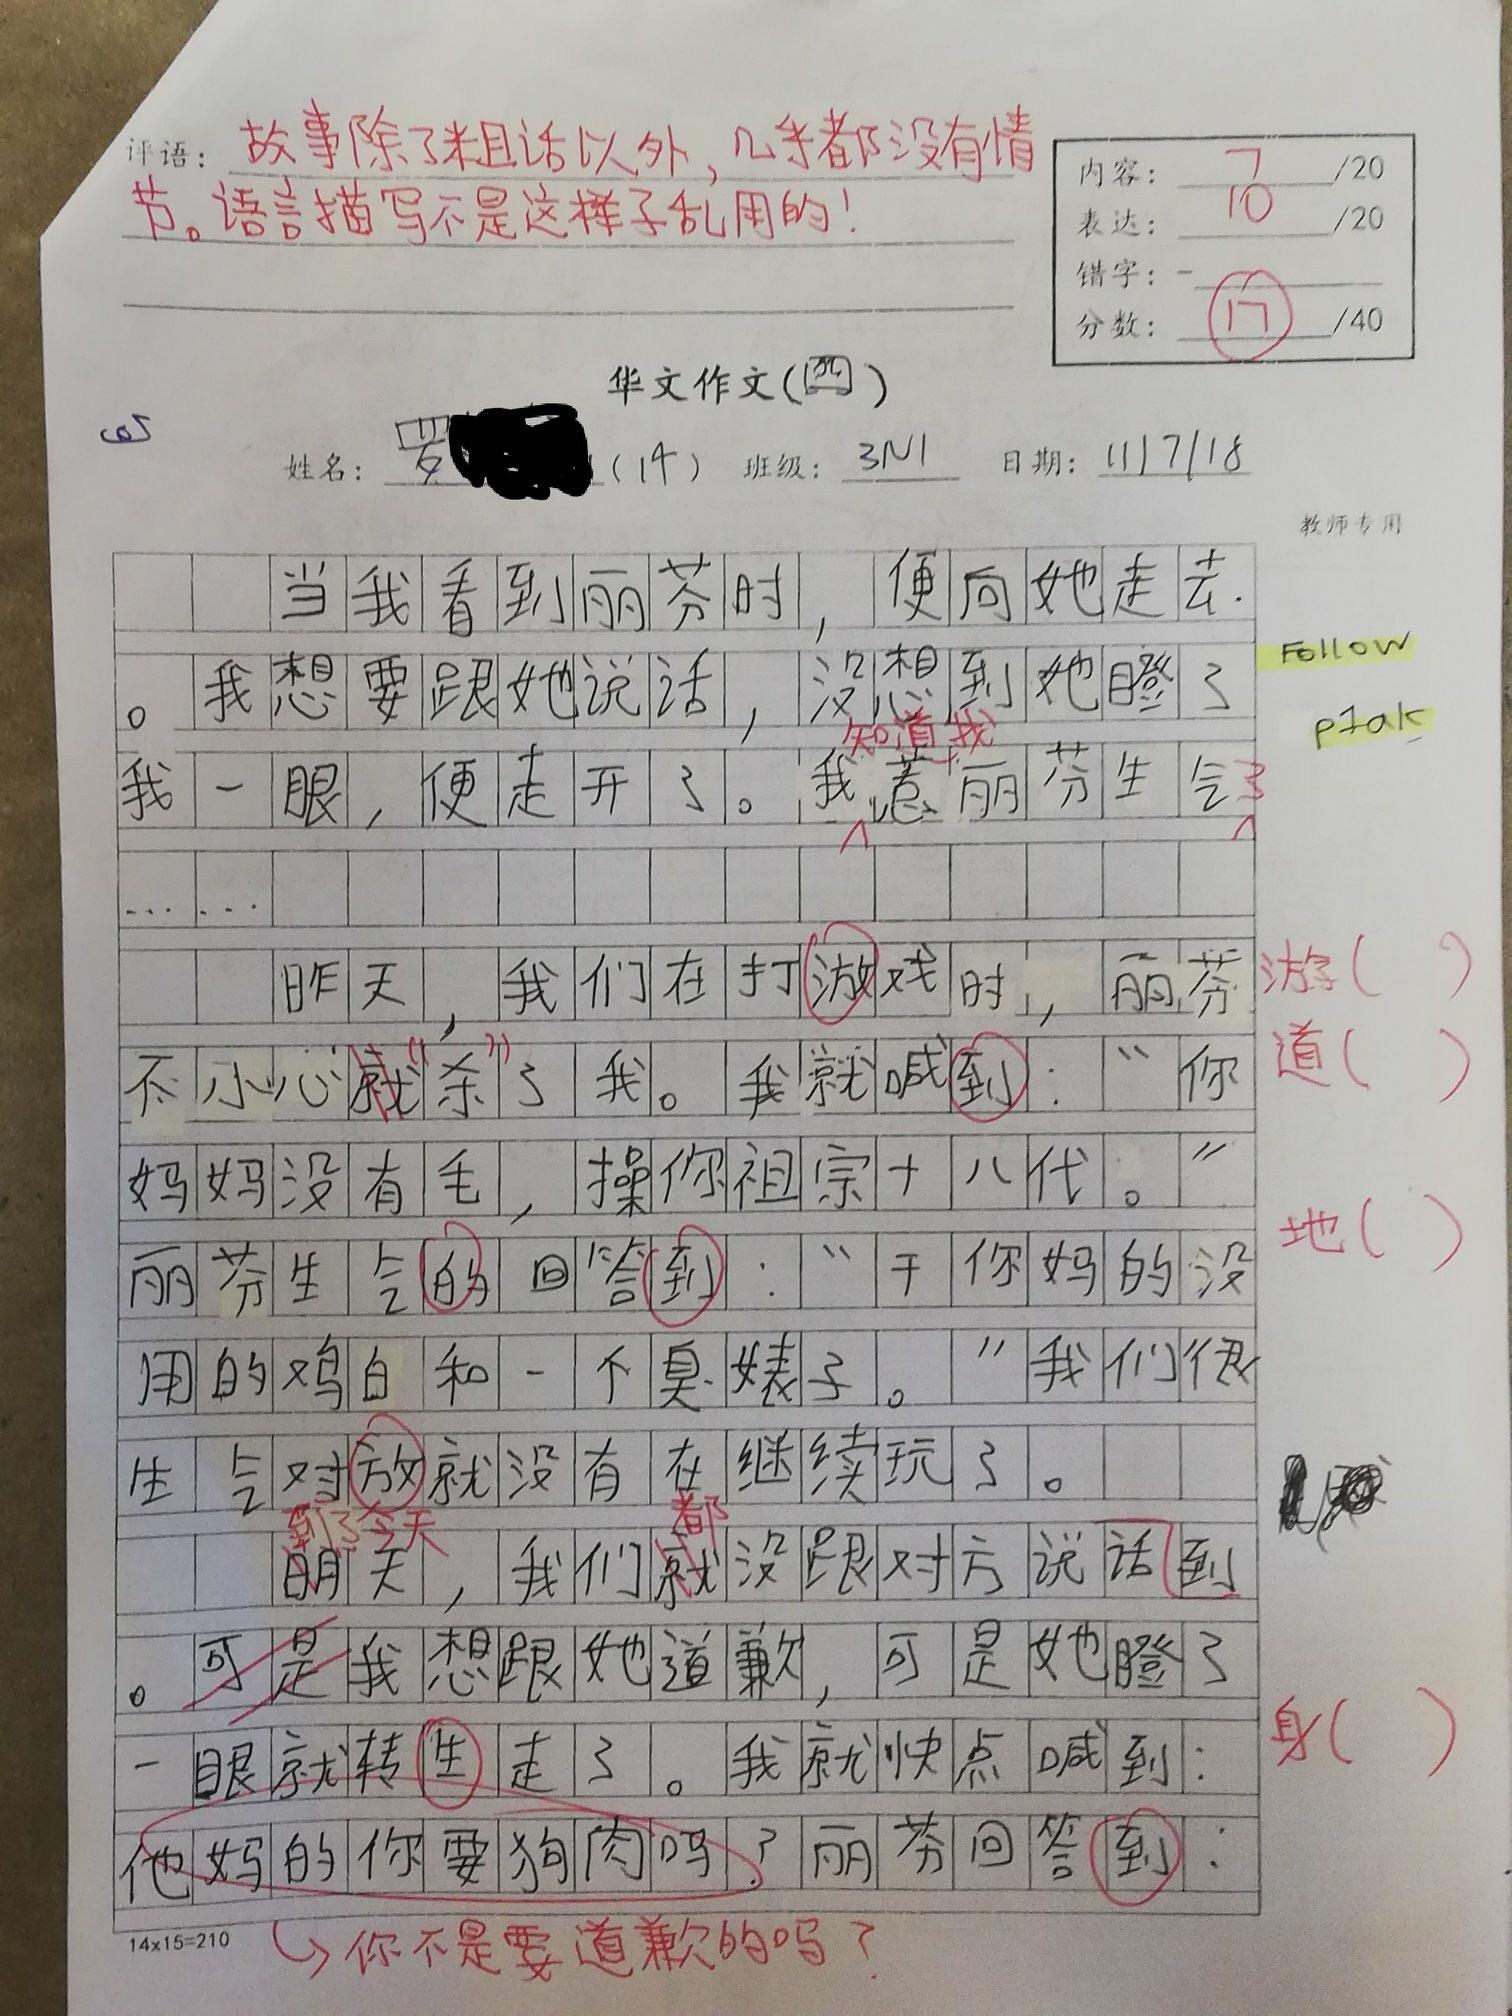 017 Essay Example Wbn5f0l88kj11 Amazing Chinese Language Writing Letter Format Topics Full